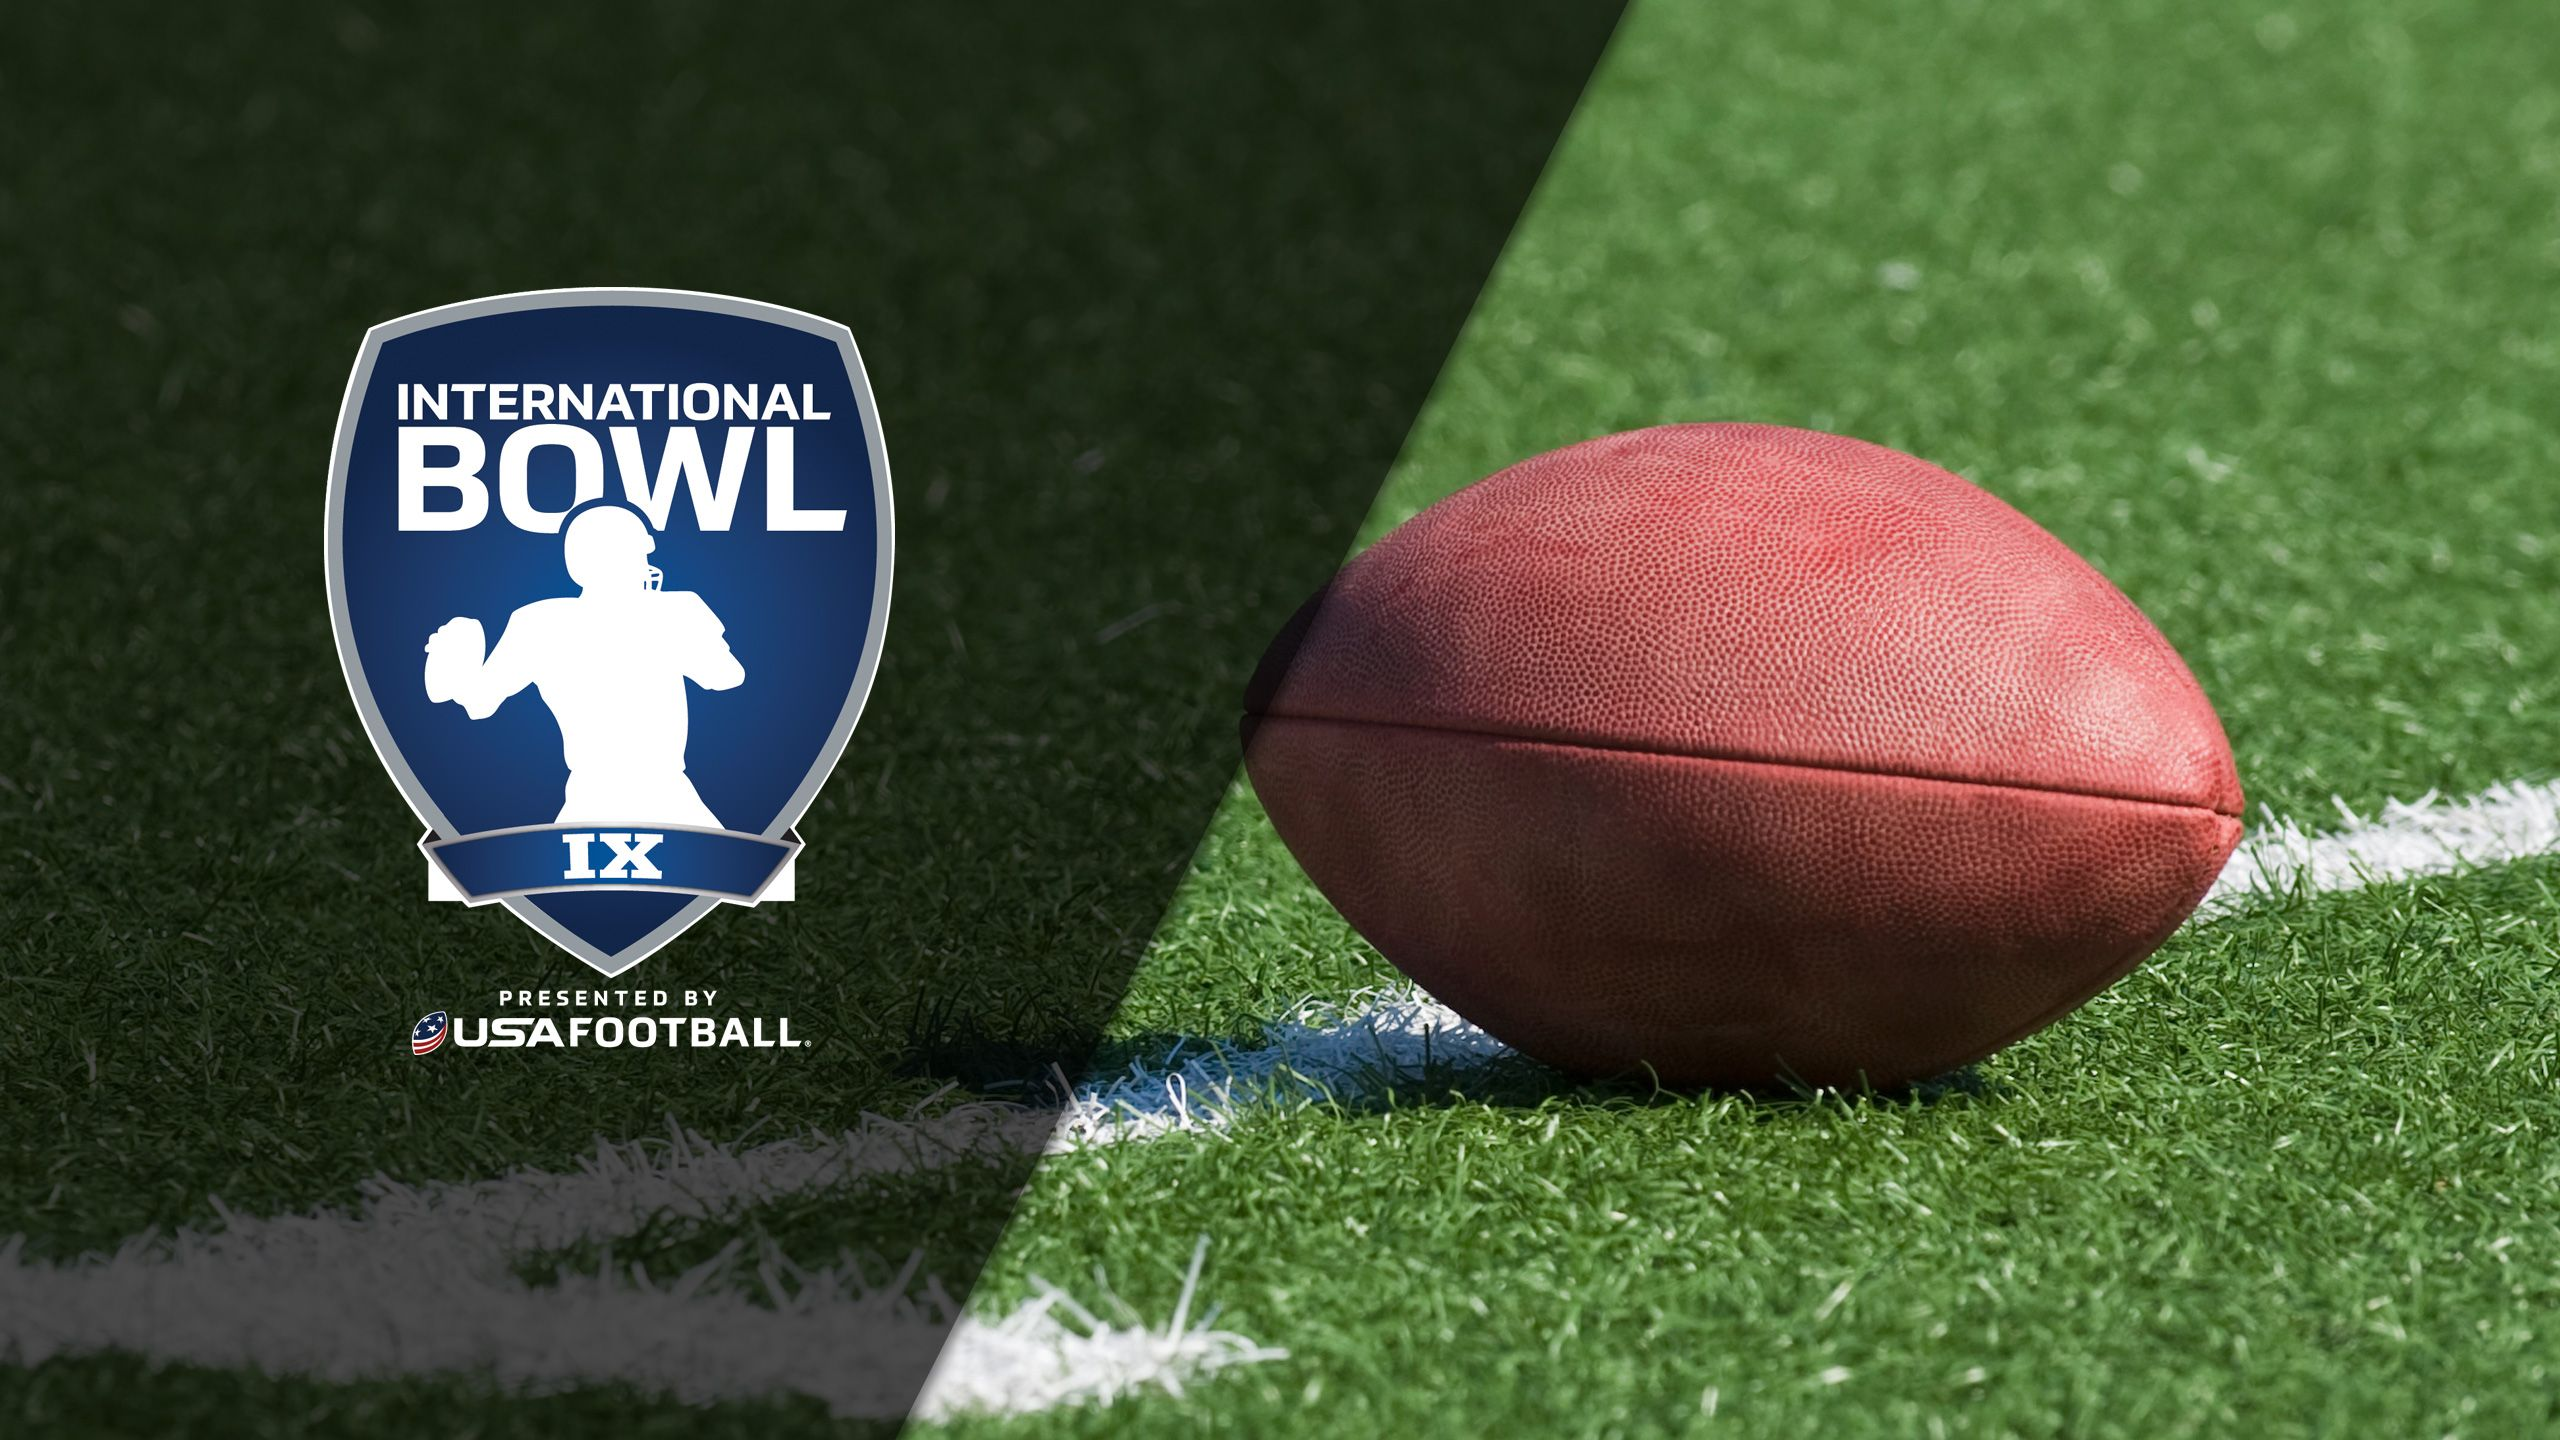 U.S. Under-17 National Team vs. Team British Columbia (International Bowl)